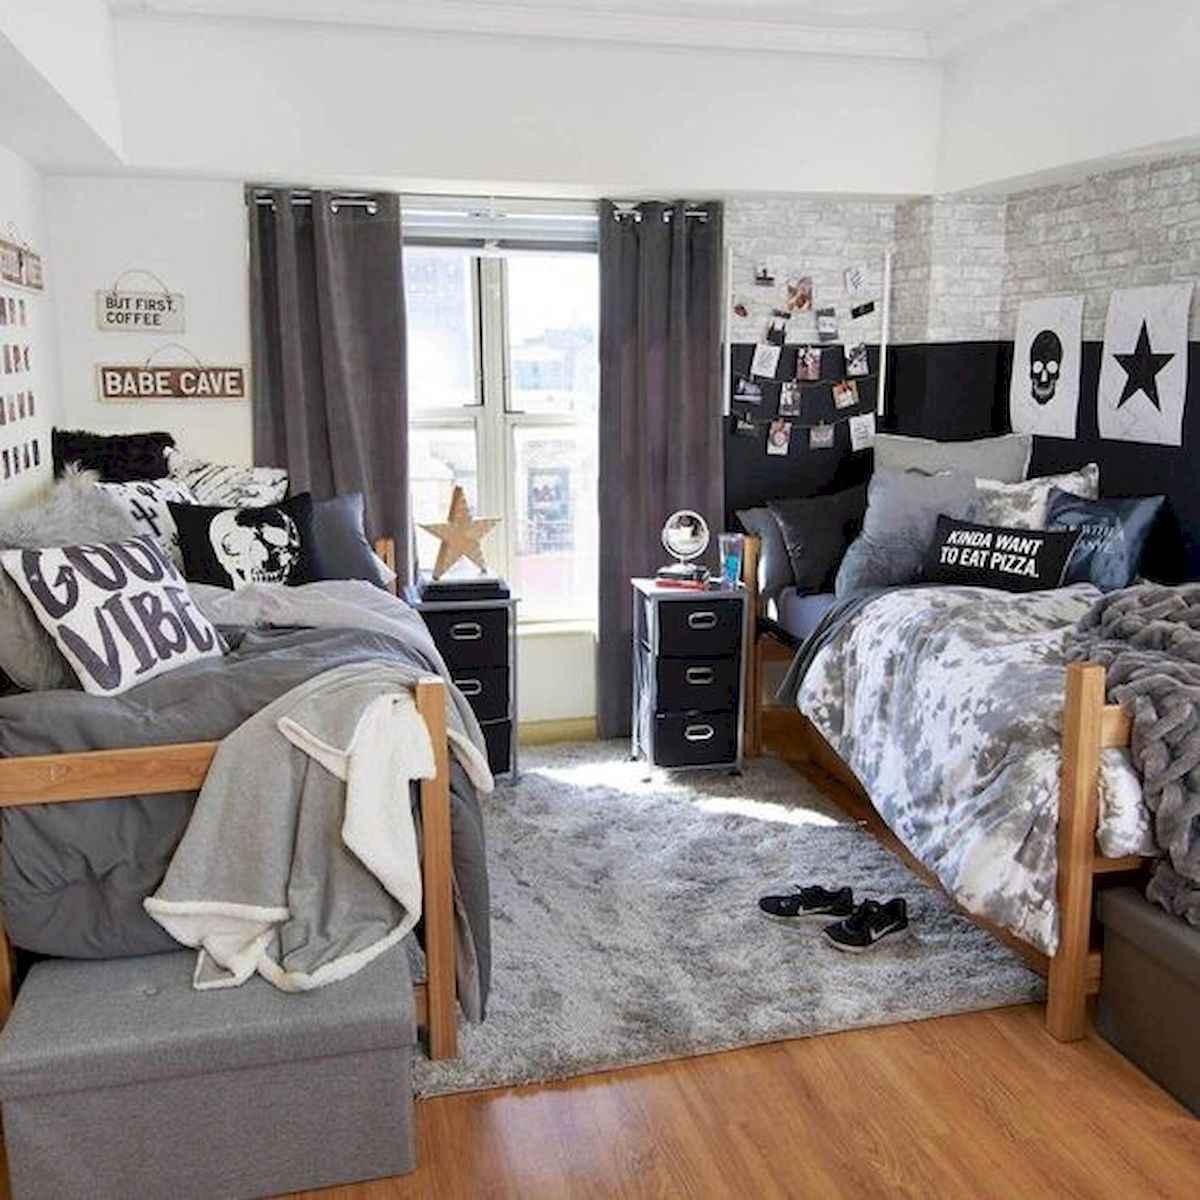 80 Fantastic Small Apartment Bedroom College Design Ideas and Decor (55)